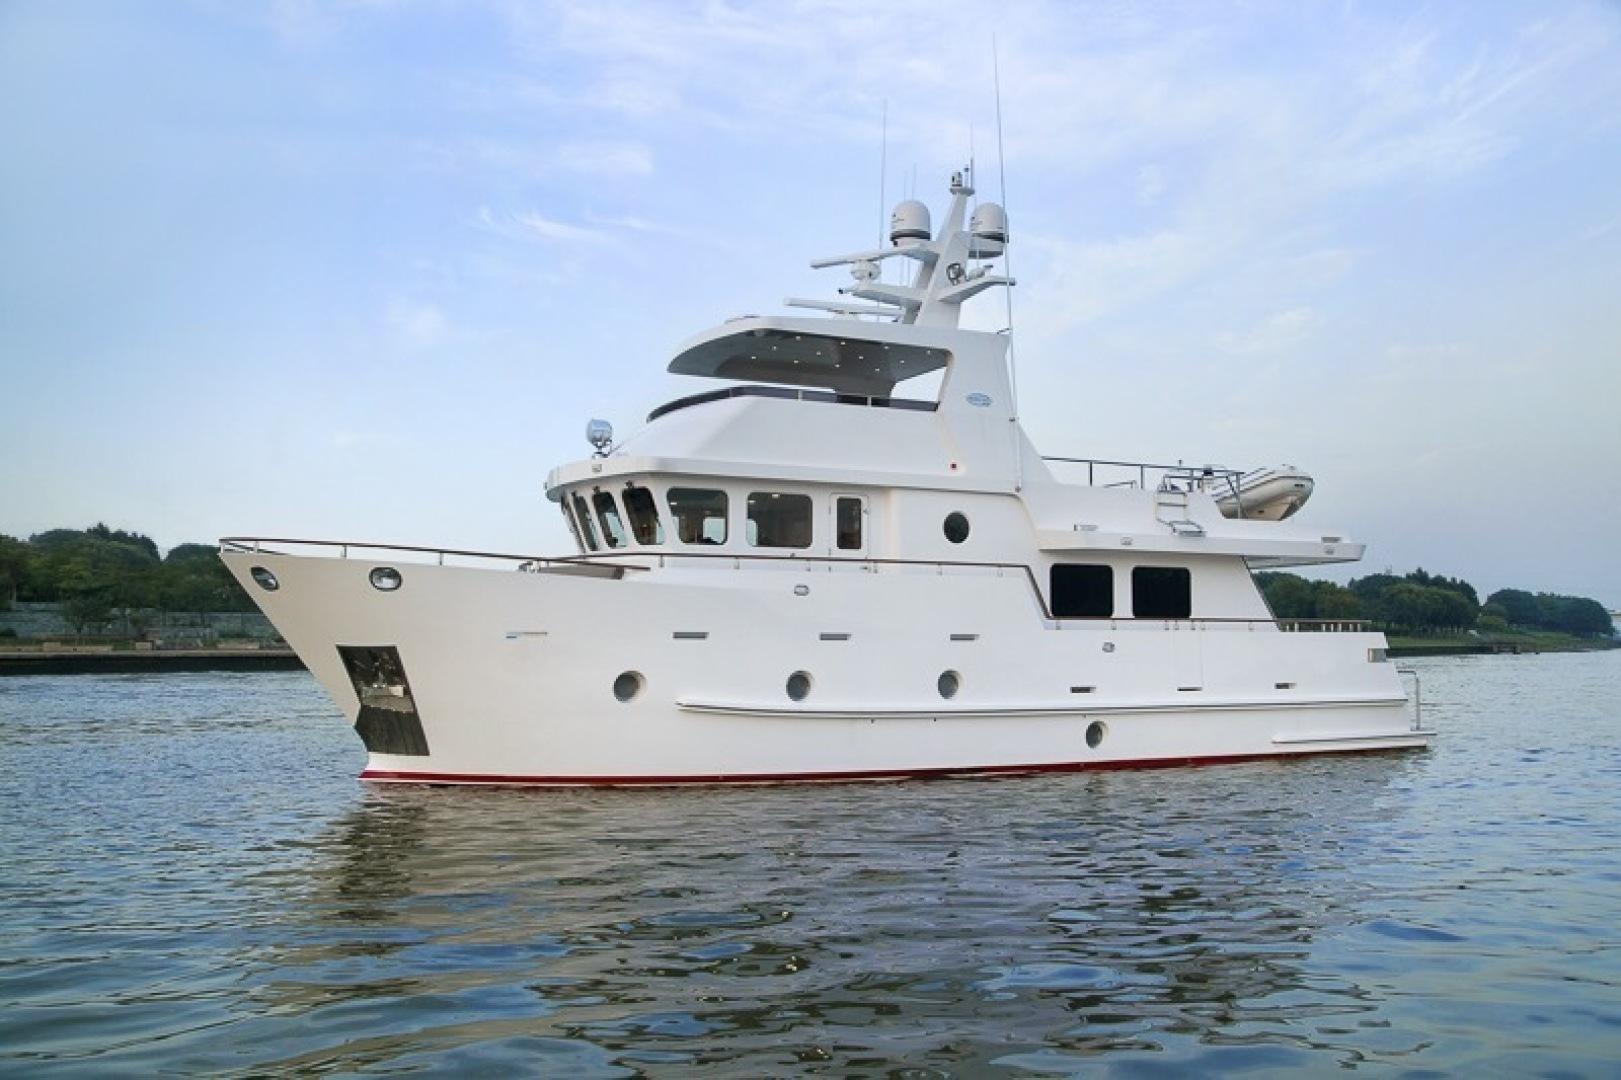 Bering-65 Bering Yacht 2013-Namaste Dania-Florida-United States-1401062   Thumbnail